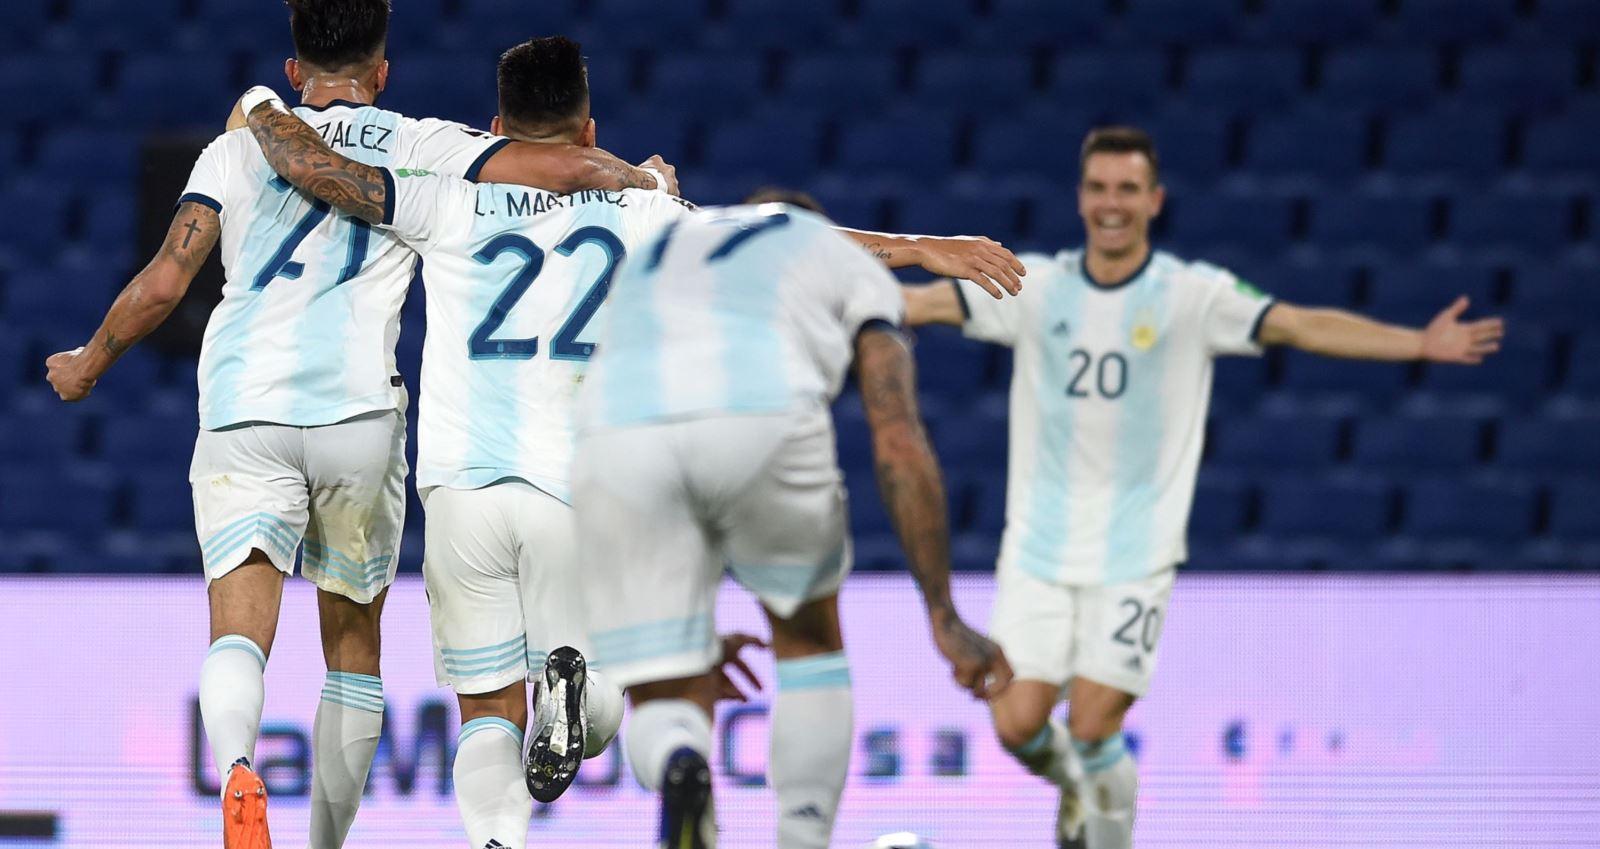 Argentina, Paraguay, vòng loại World Cup 2022, Nam Mỹ, Messi, Lautaro Martinez, bóng đá, bong da